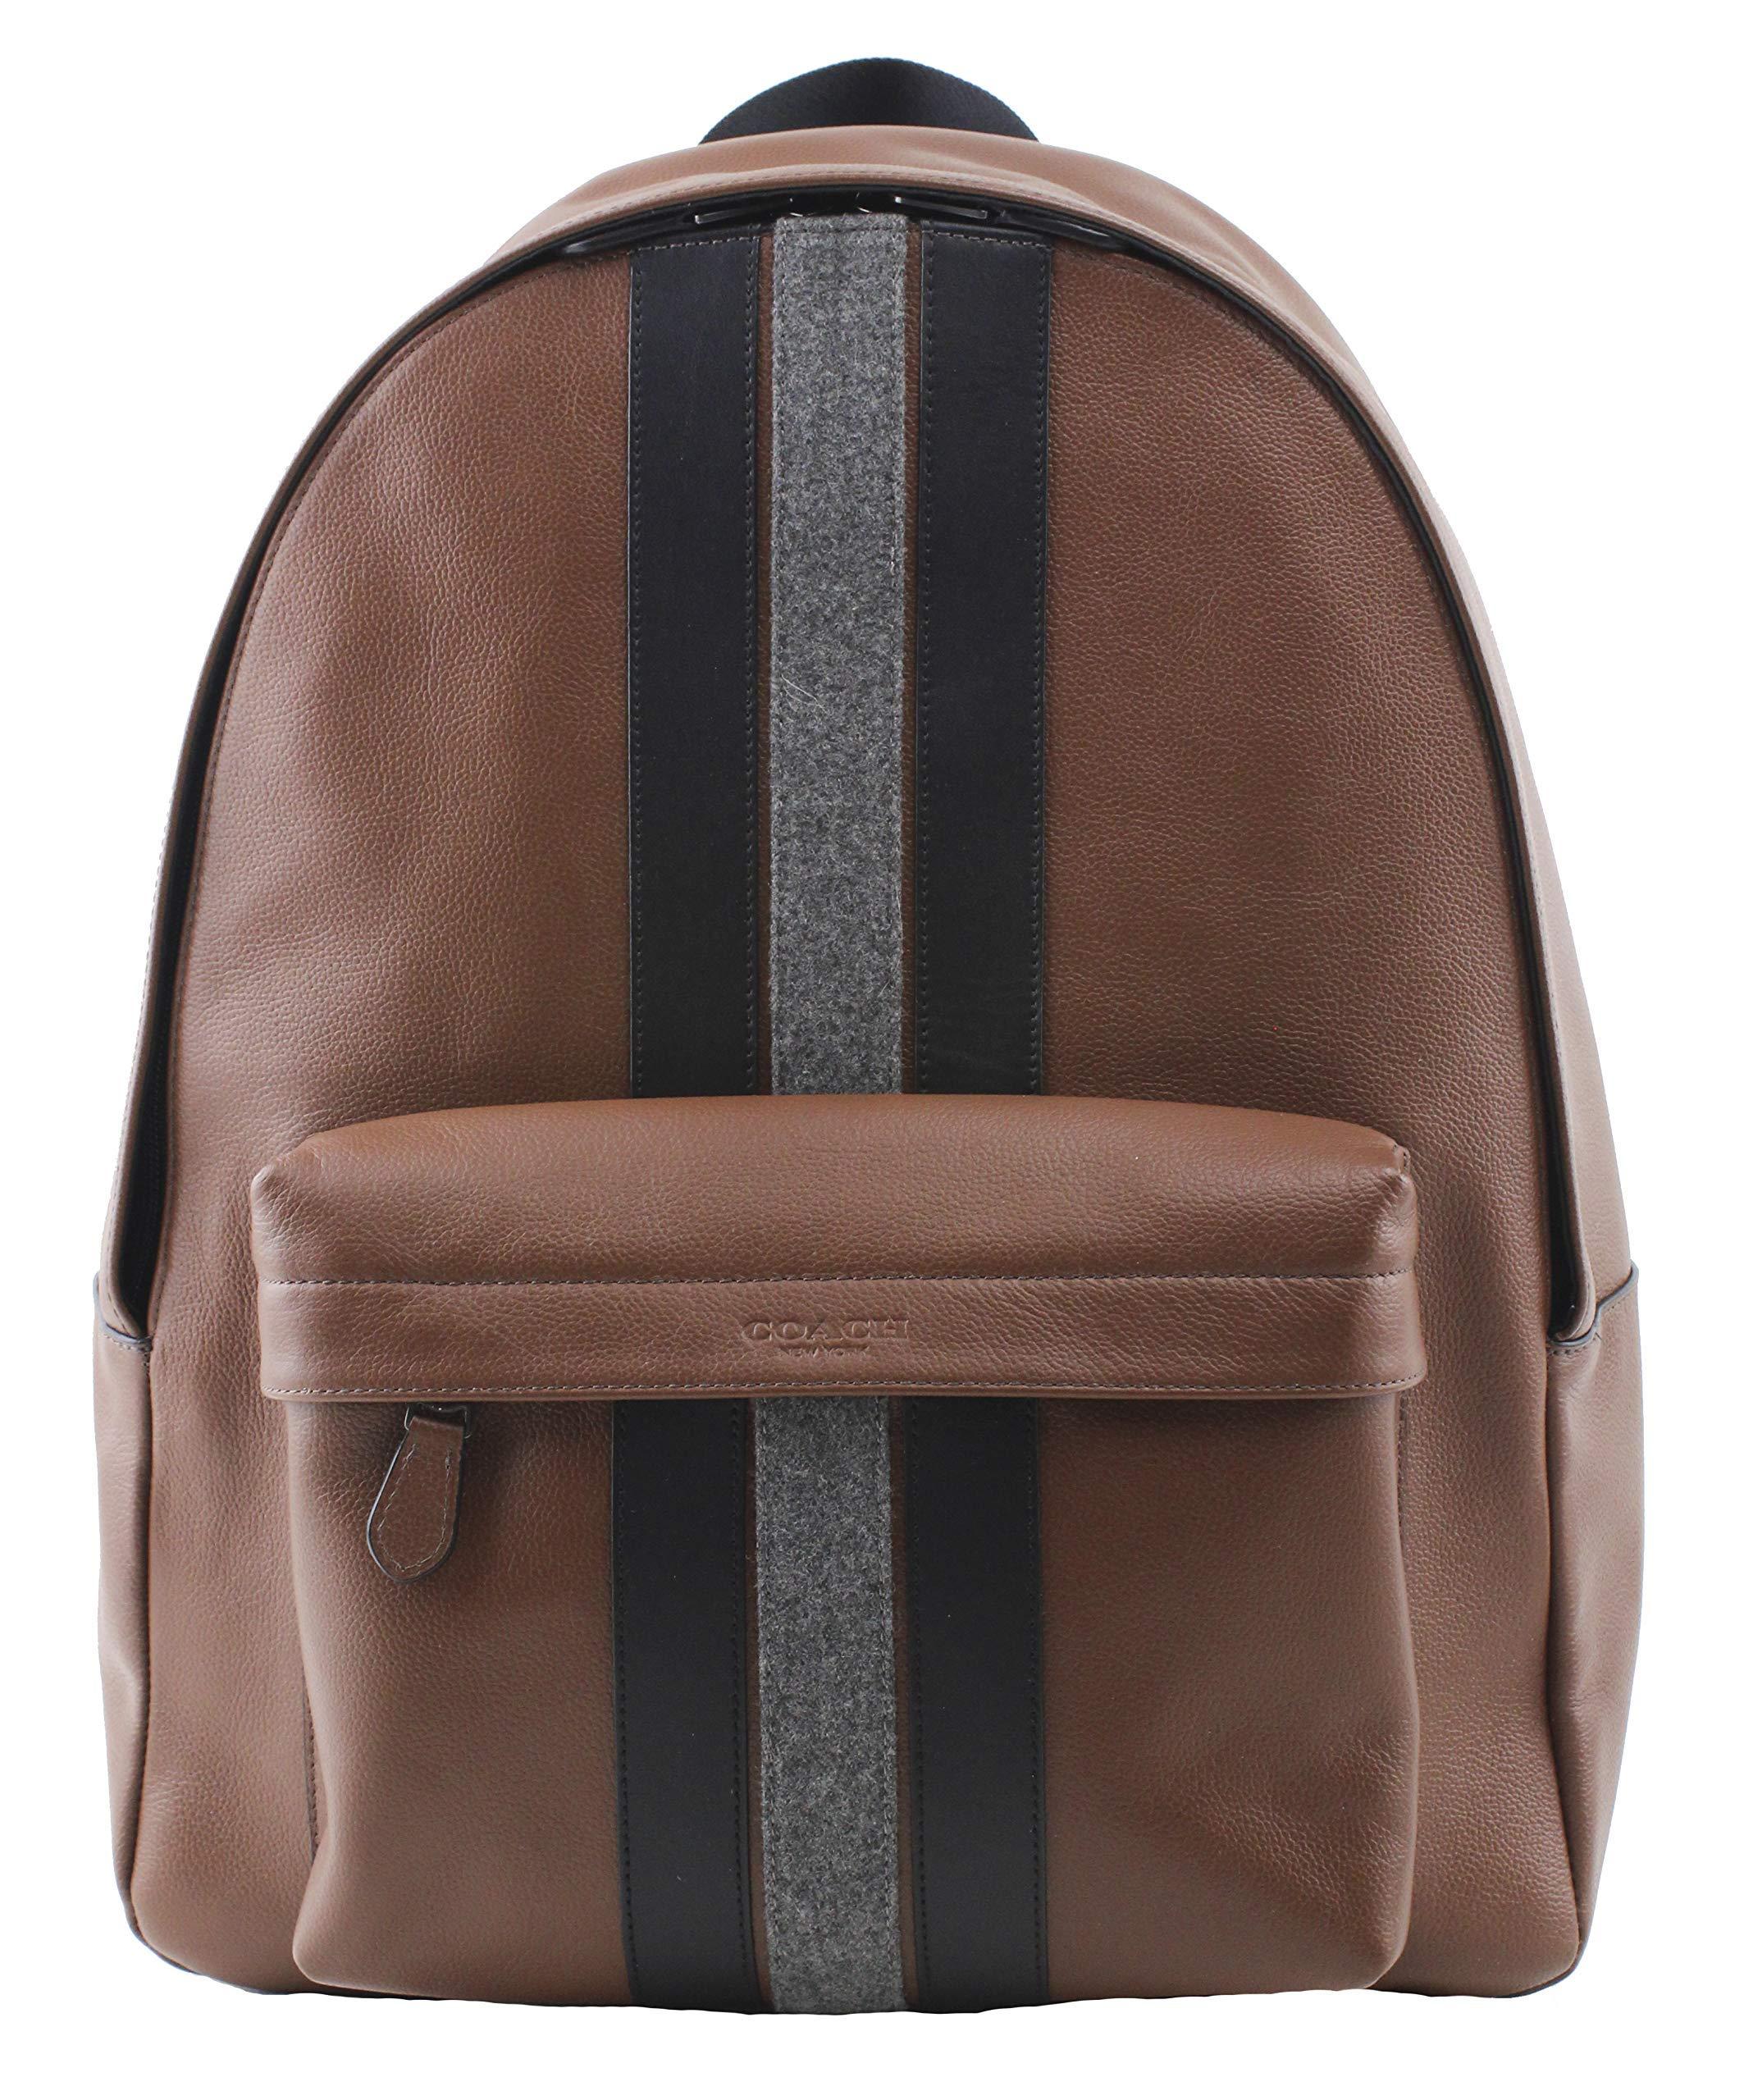 QB//Black Coach Coach New York F11250 Charles Pebble Leather Baseball Stitch Backpack Bookbag